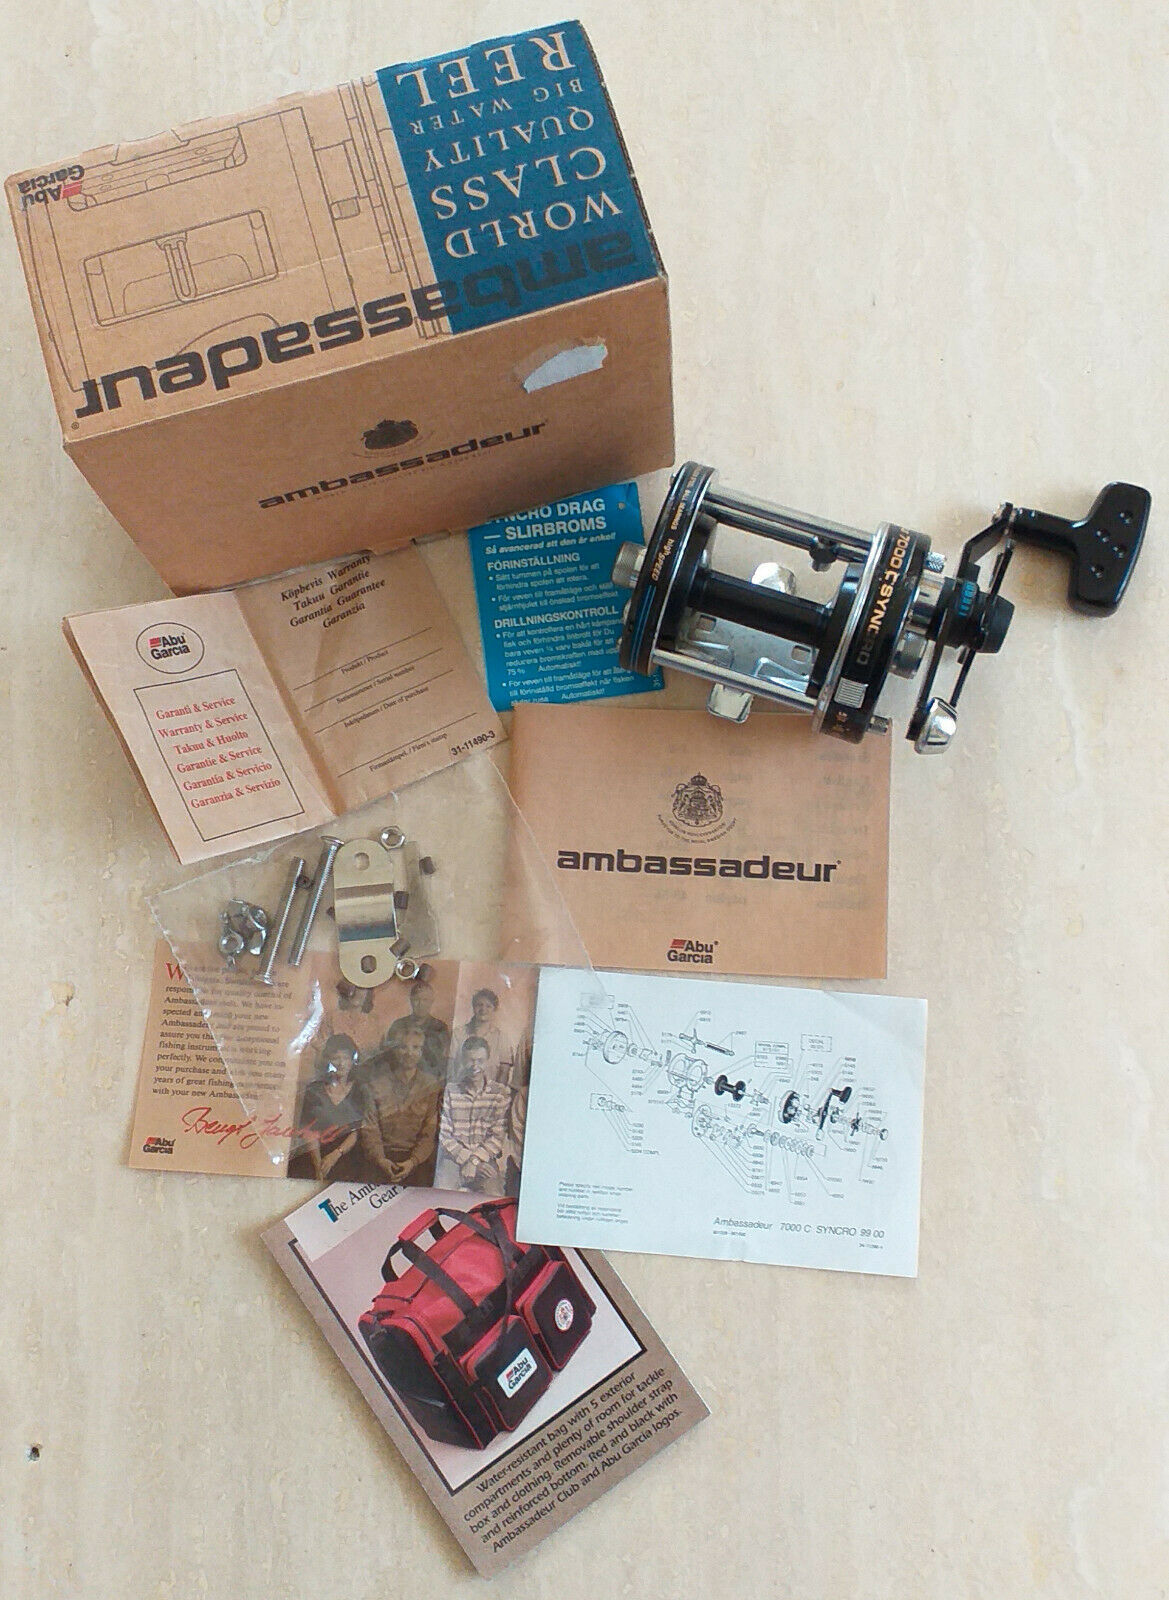 Abu Ambassadeur 7000 C Syncro with cardboard ABU Ambassadeur  7000 C with box  authentic